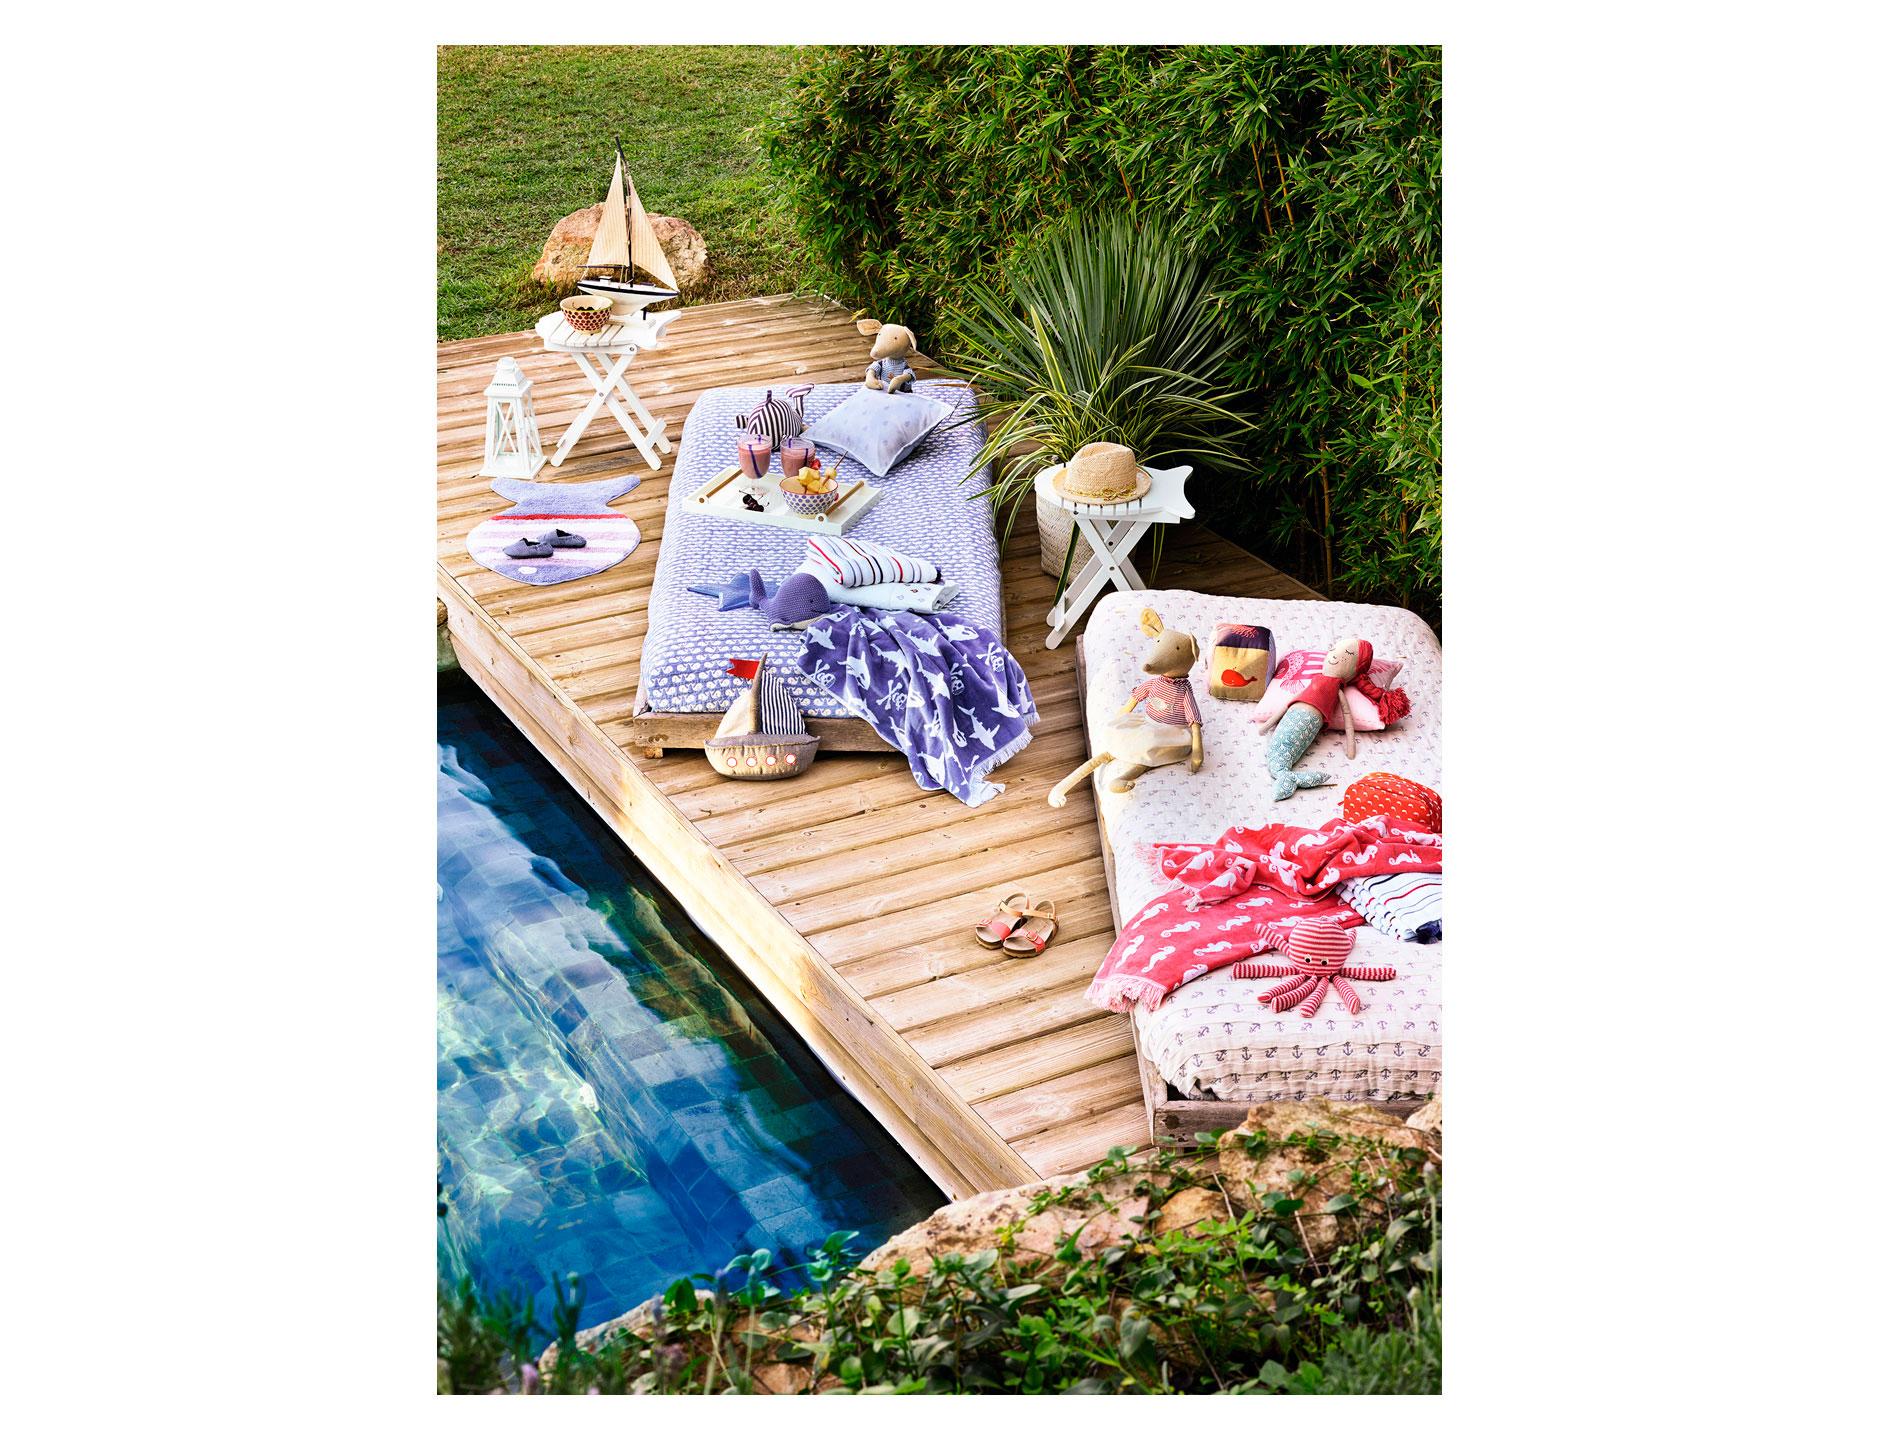 Zara home primavera verano 201539 - Catalogo de zara primavera verano 2015 ...